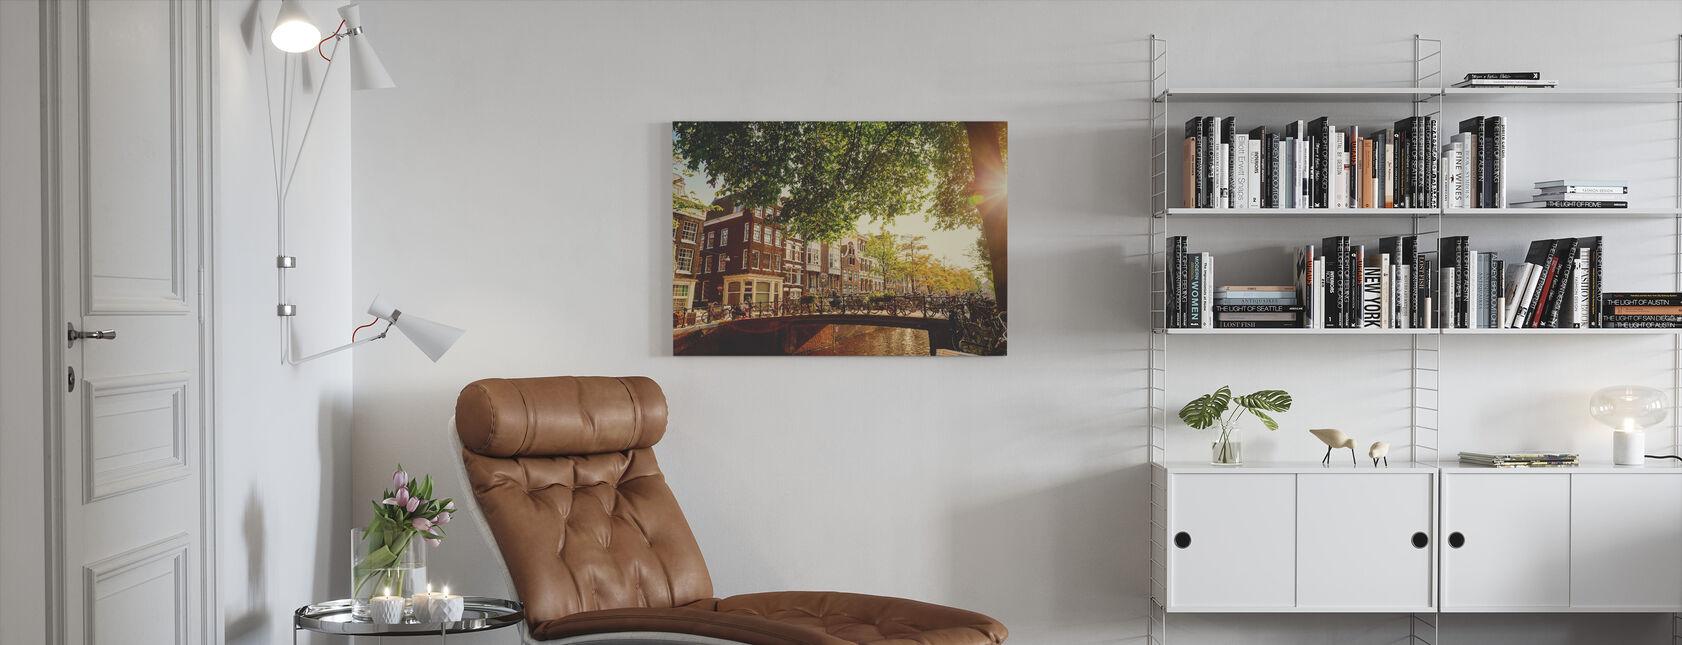 Bridge in Amsterdam - Canvas print - Living Room